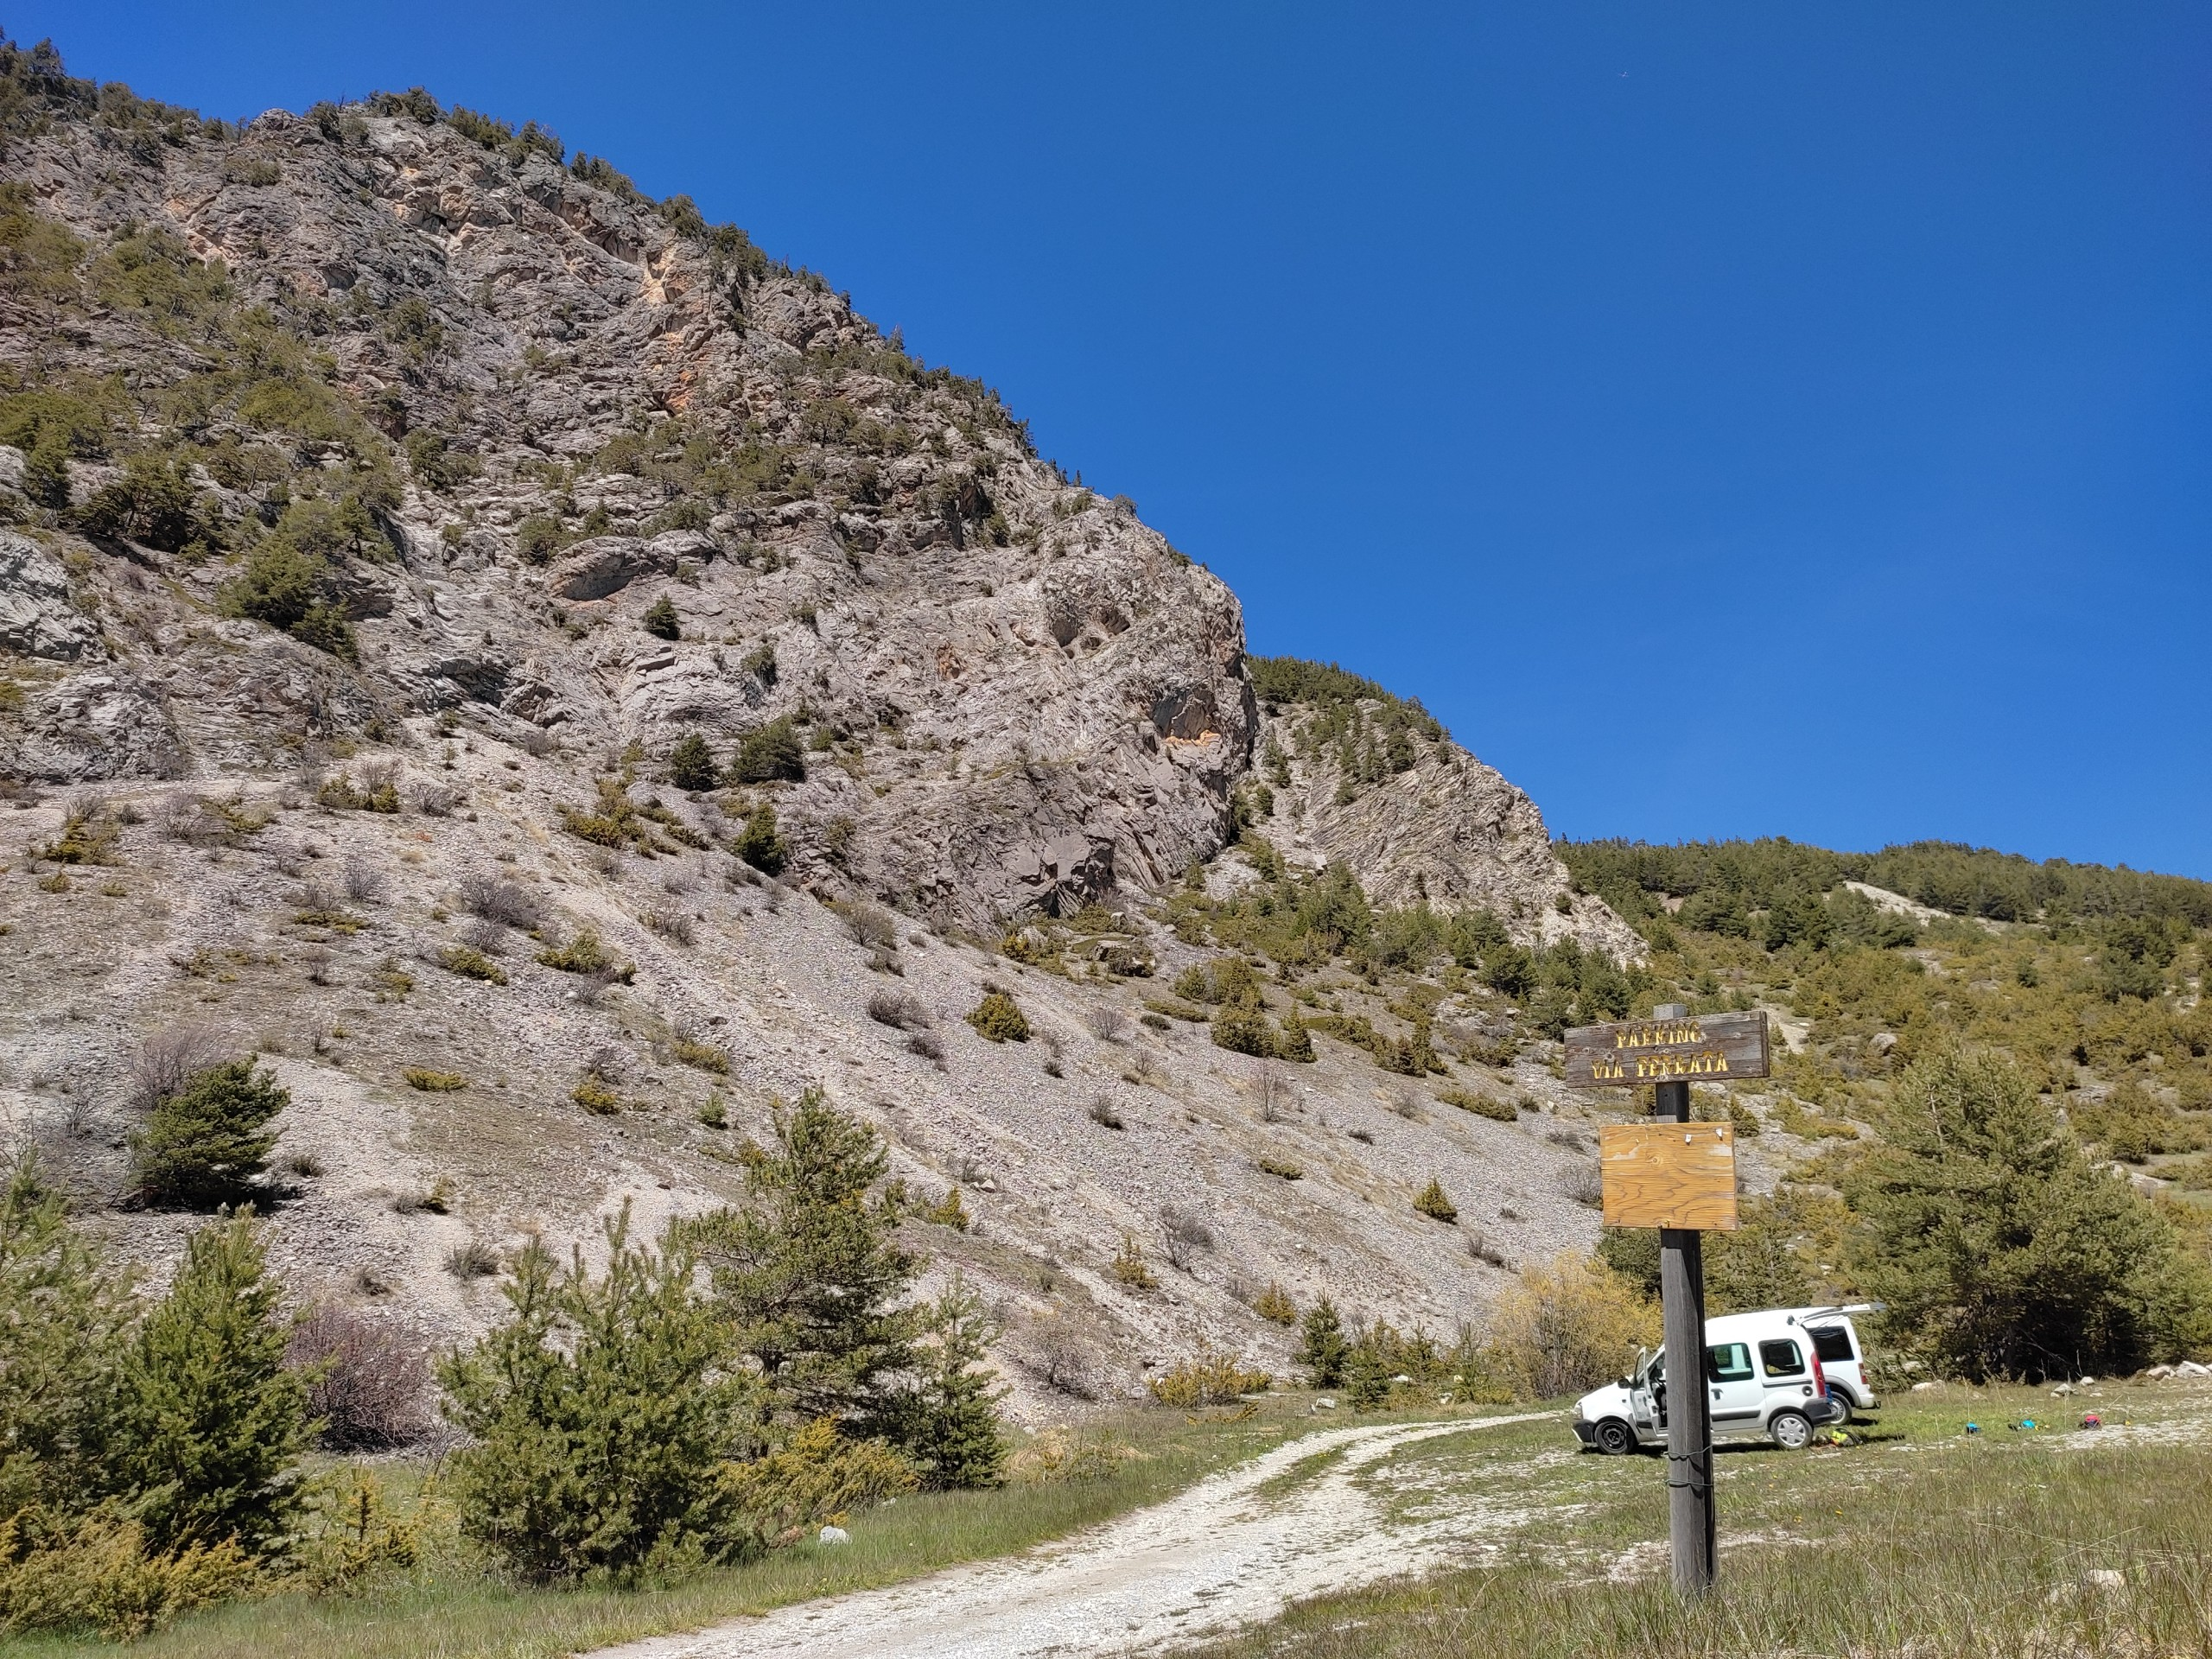 La falaise e la via ferrata de Ceillac